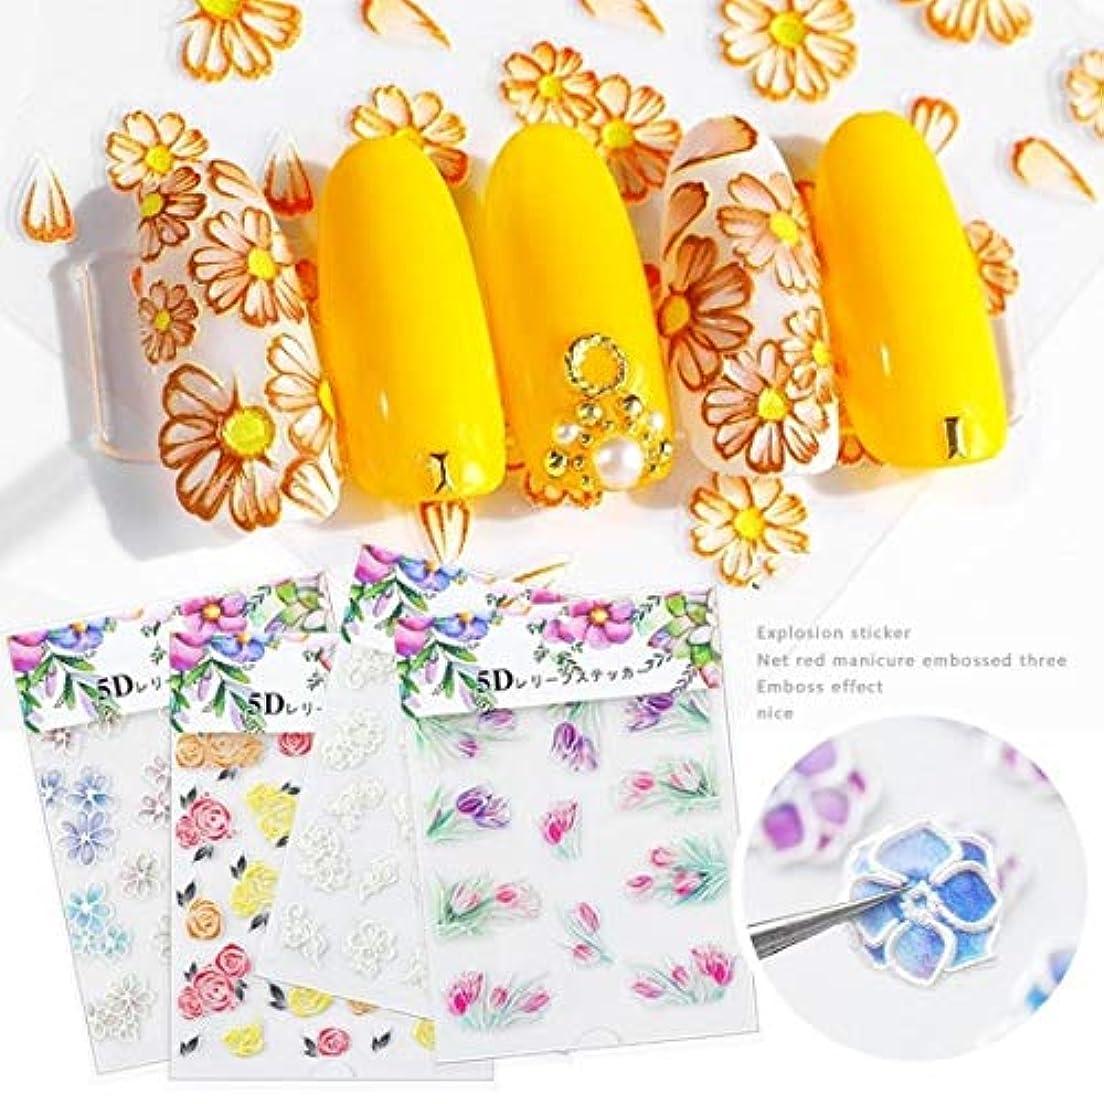 OWNFSKNL 5Dネイルステッカーセット10枚の花柄自己粘着転写デカールネイルアートマニキュア装飾ツール